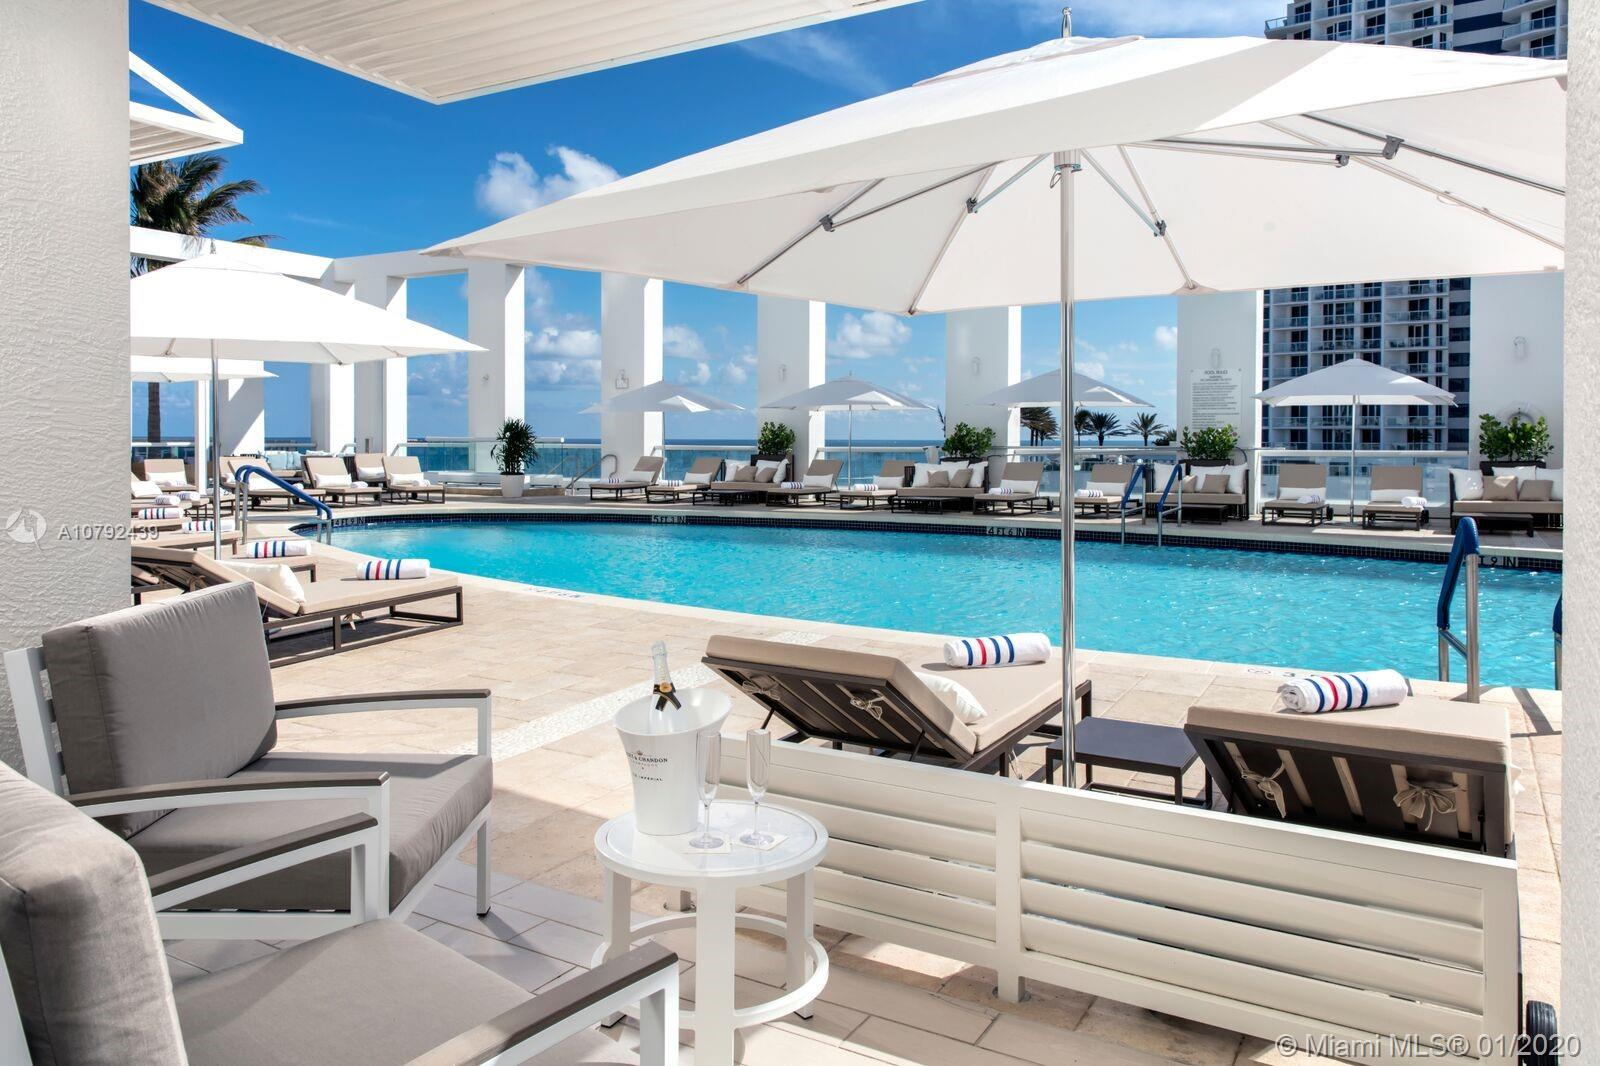 551 N Fort Lauderdale Beach Blvd # 1609, Fort Lauderdale FL 33304